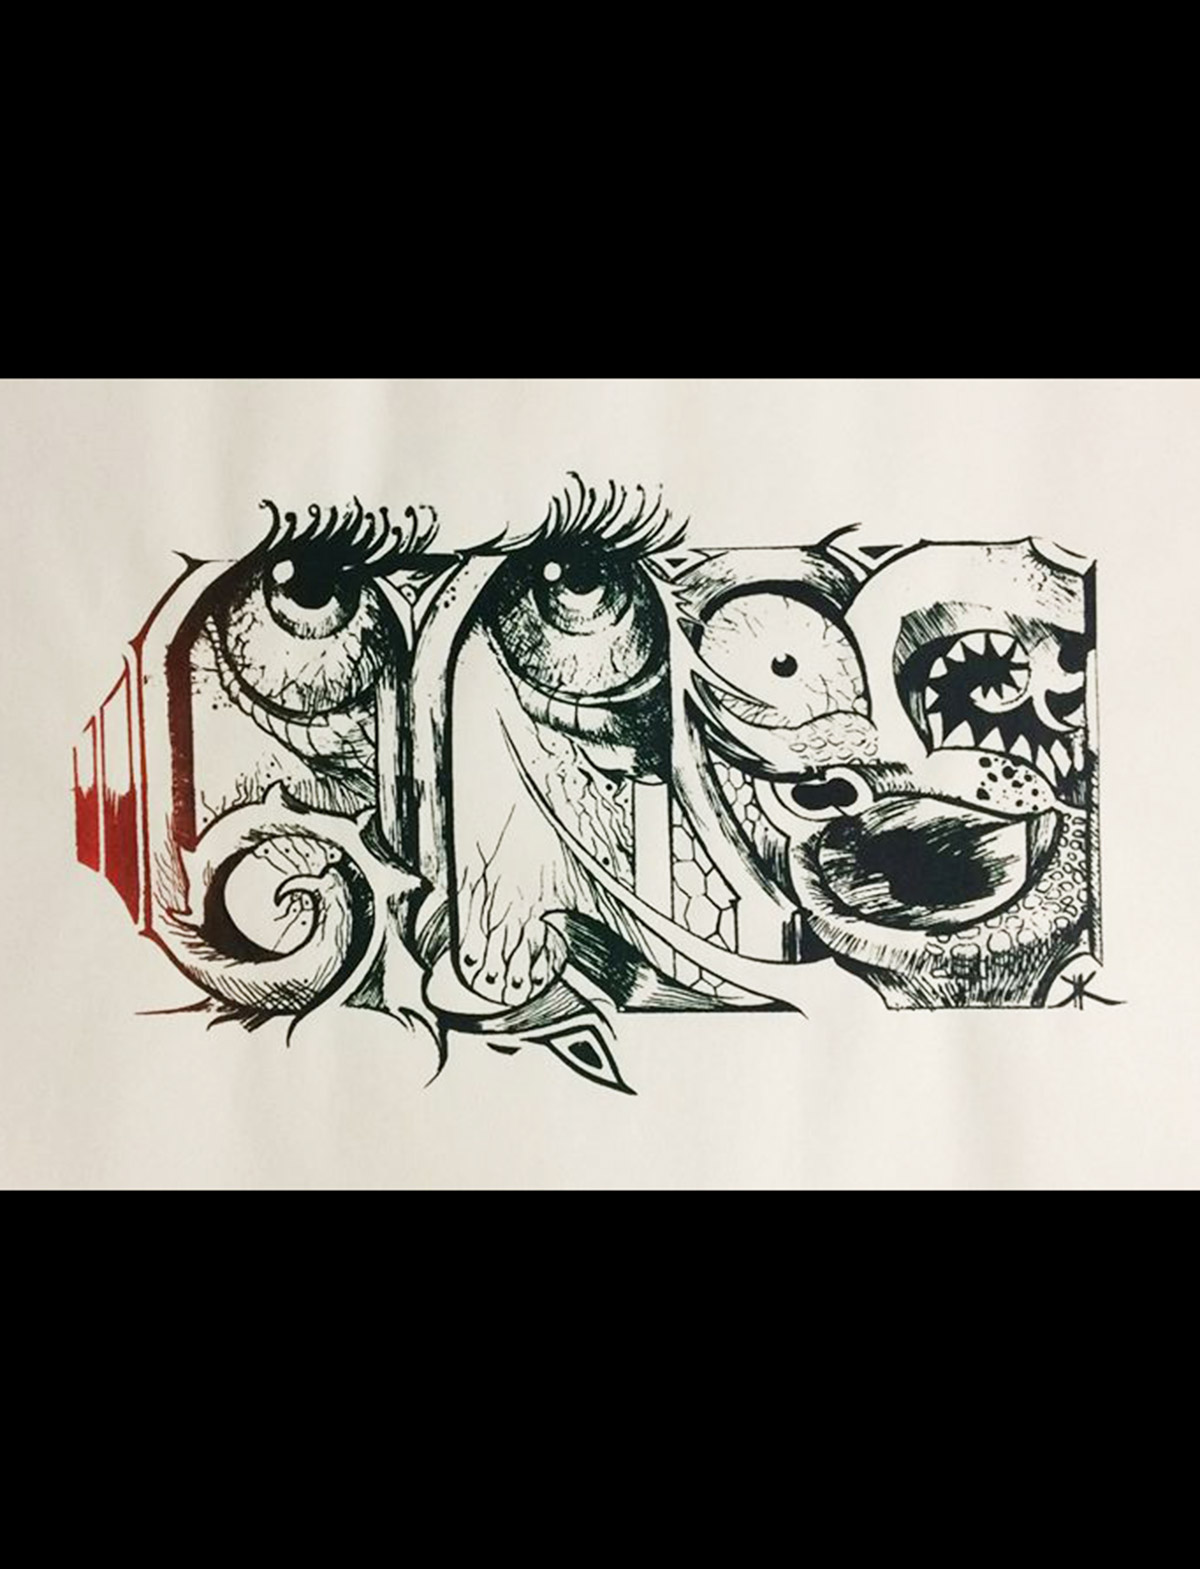 kk story, artwork by Konstantinos Karakostas on transparent paper